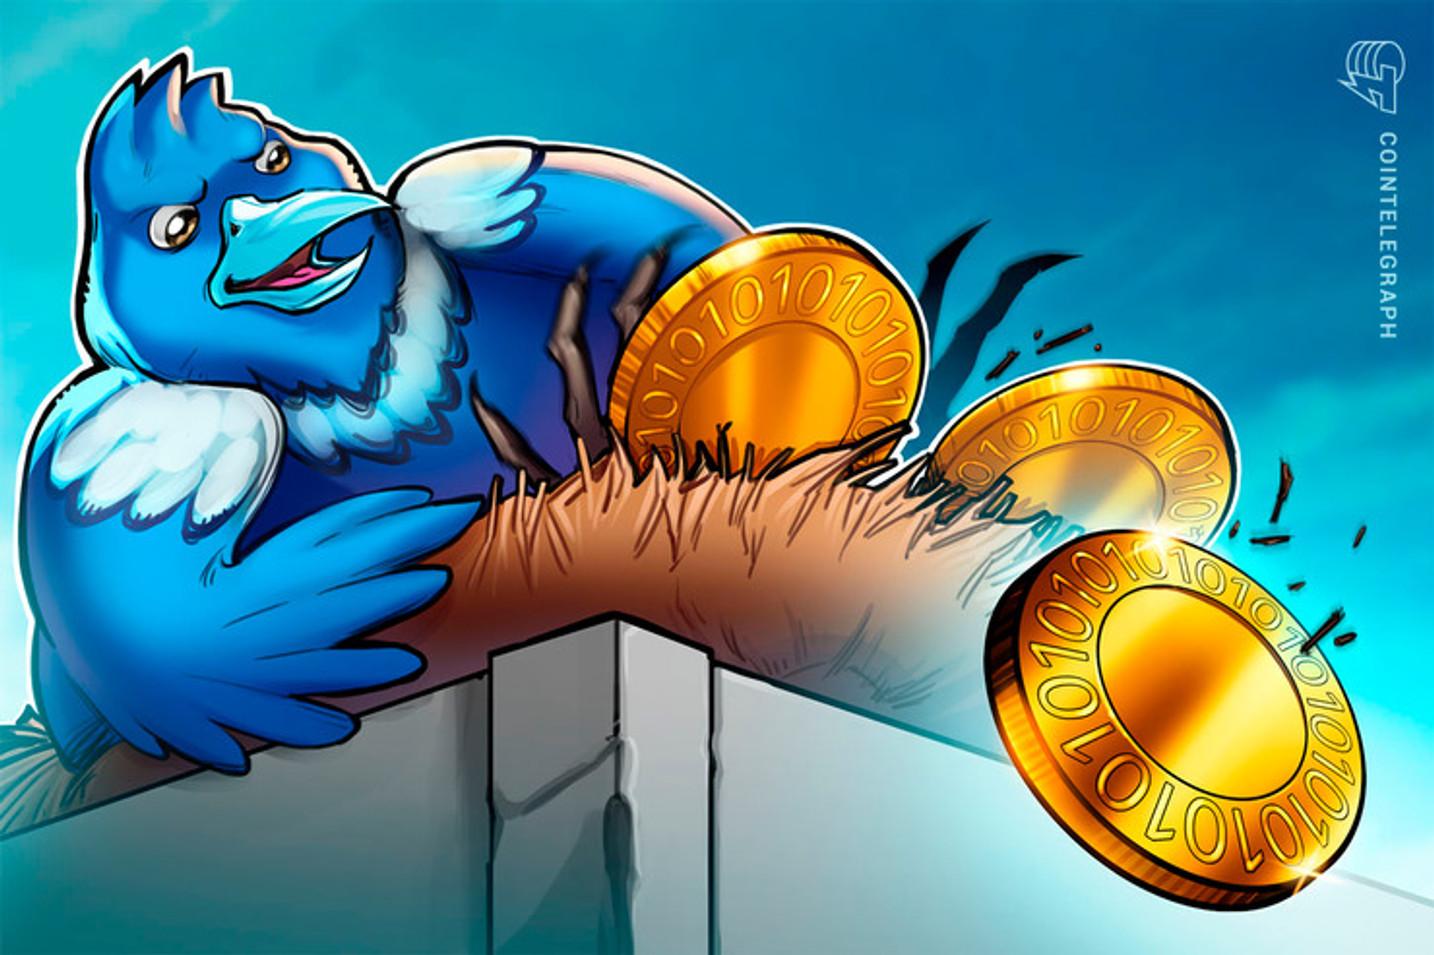 Comunidad cripto en Twitter descarga contra actualización de informe sobre manipulación de precios de Bitcoin por Tether/Bitfinex